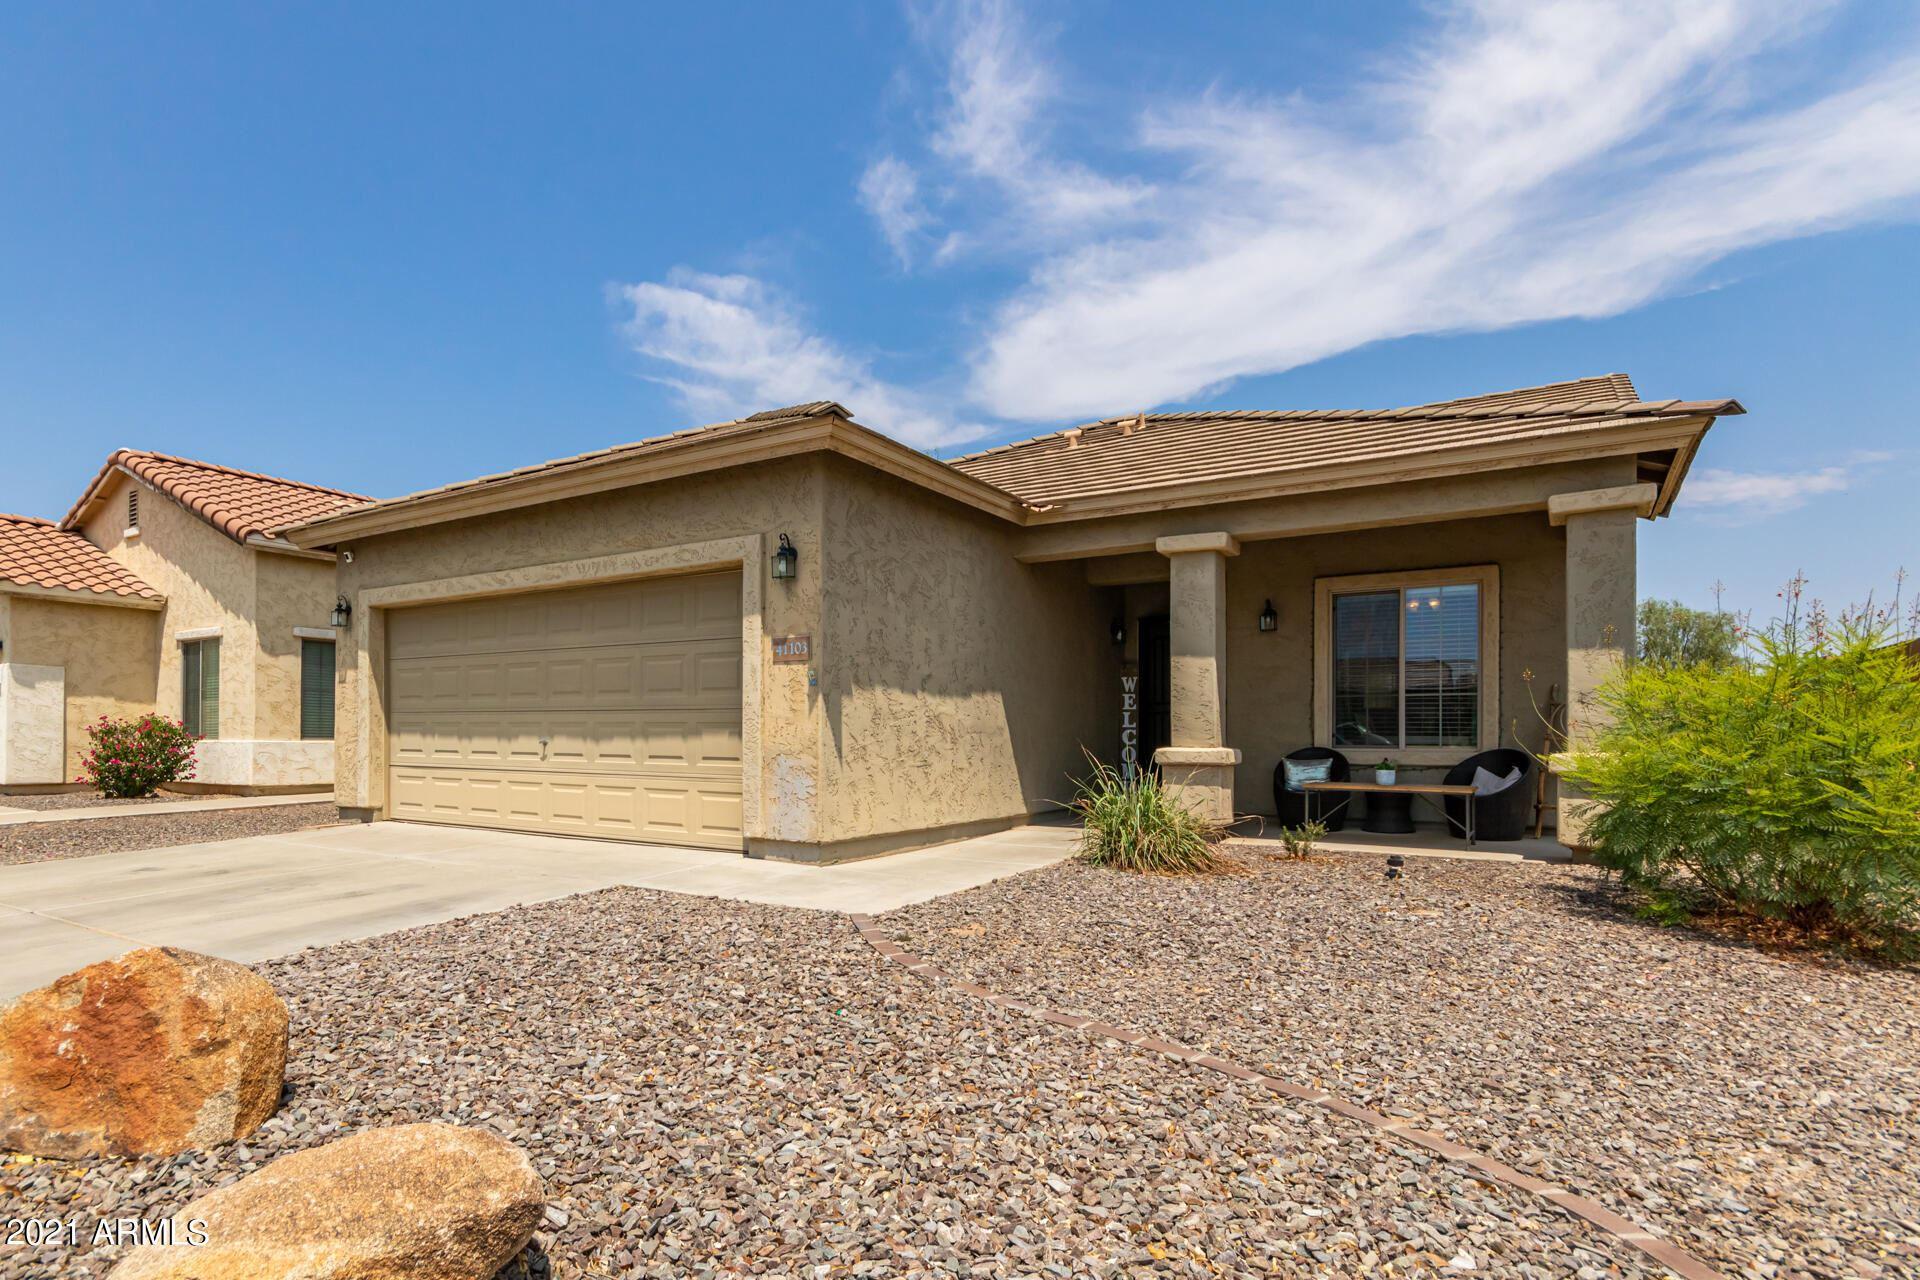 Photo of 41103 N STENSON Drive, San Tan Valley, AZ 85140 (MLS # 6268619)